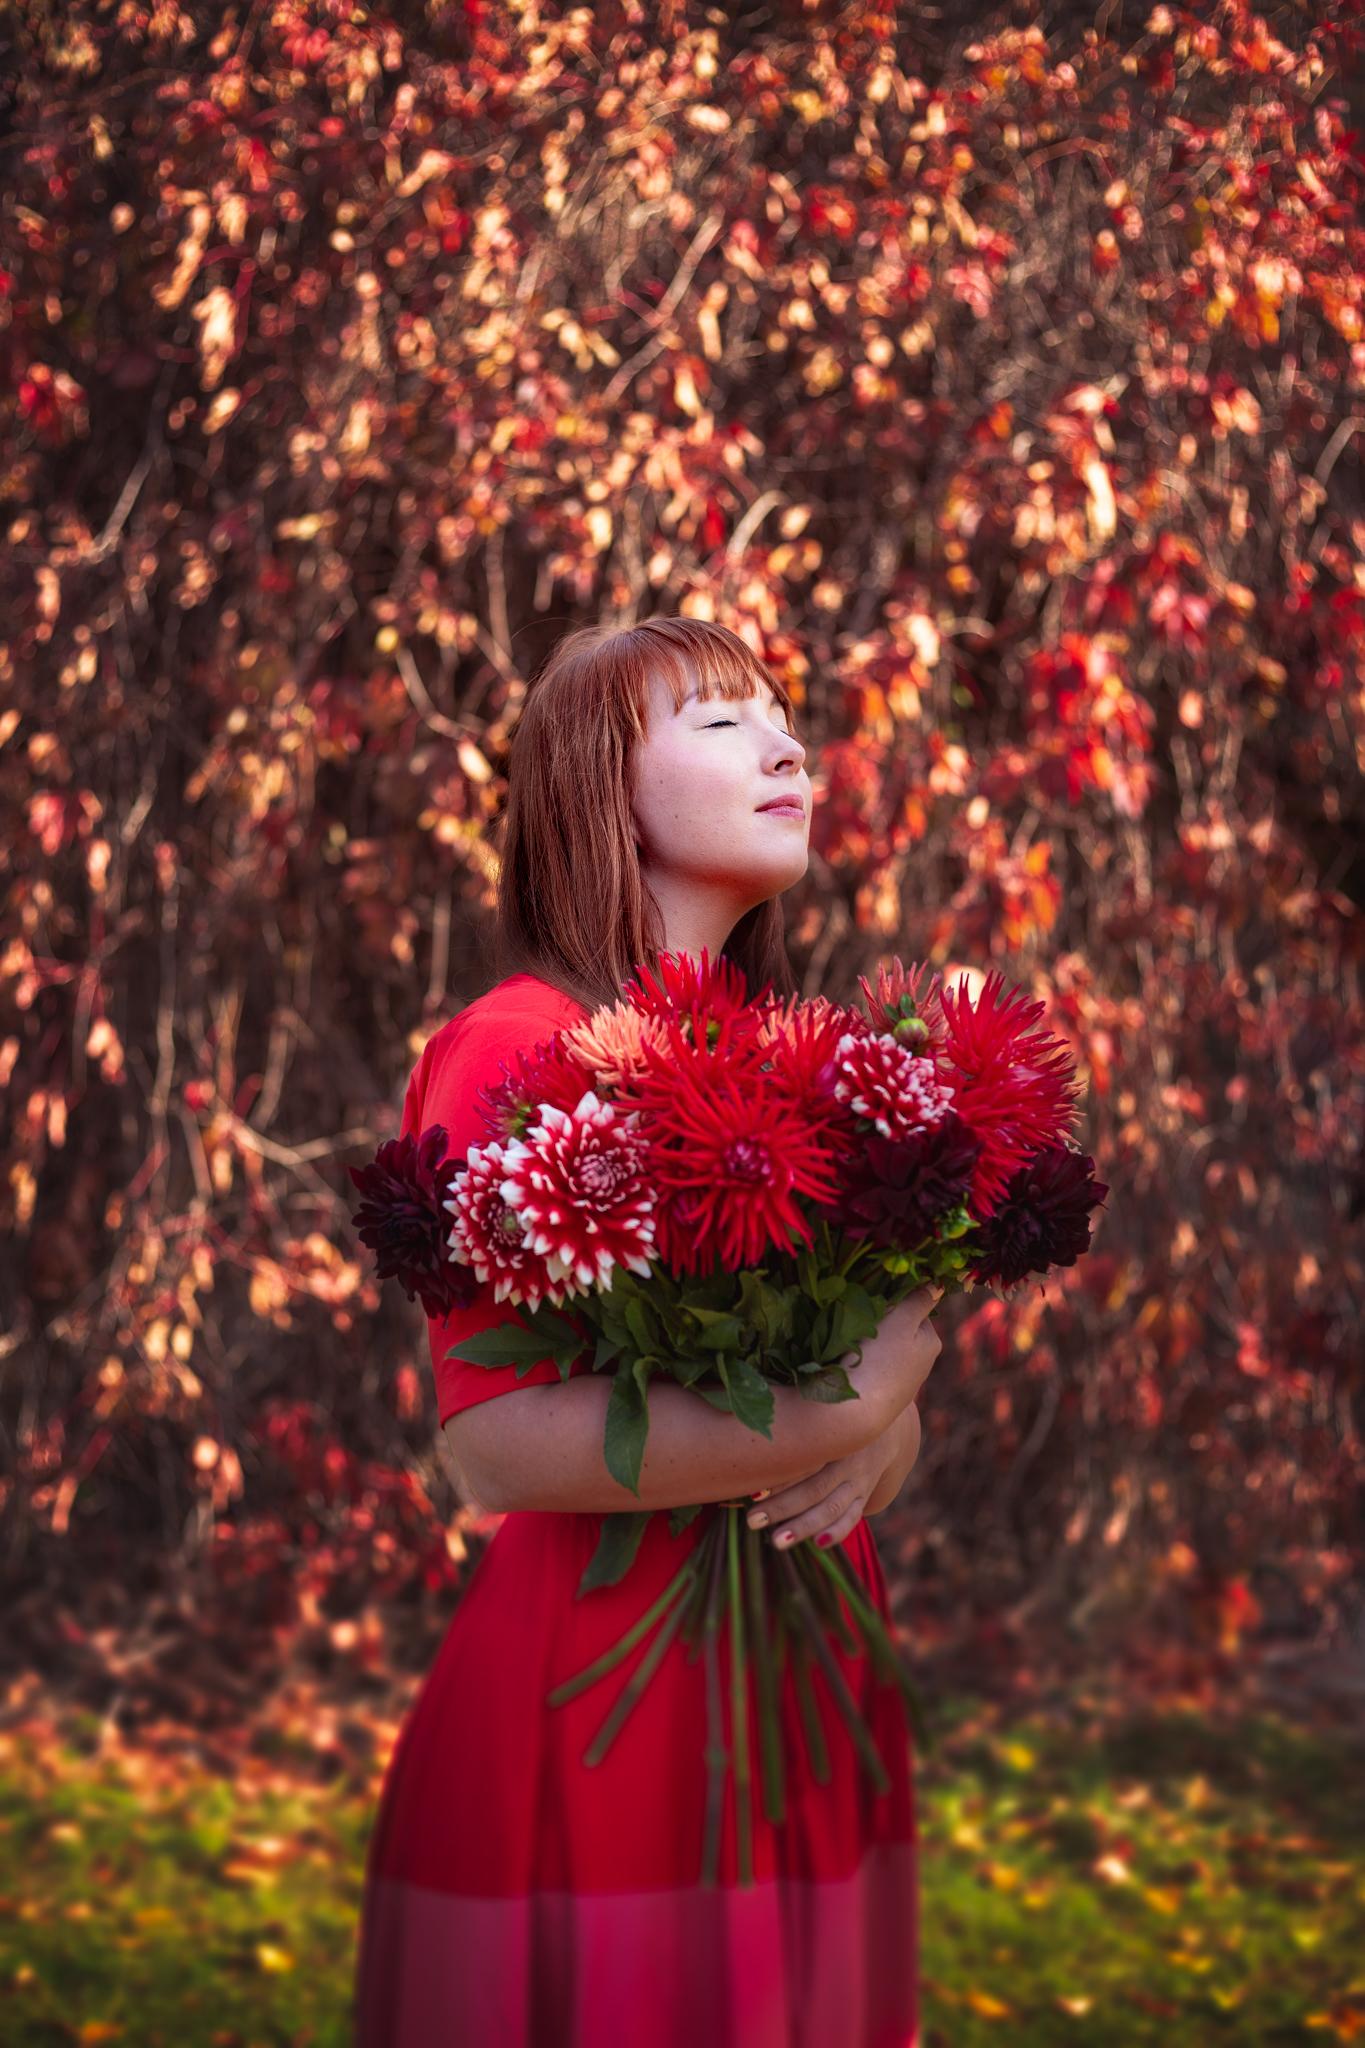 Rudens fotosesija rudens lapās. Fotogrāfs: Linda Dambeniece-Migliniece